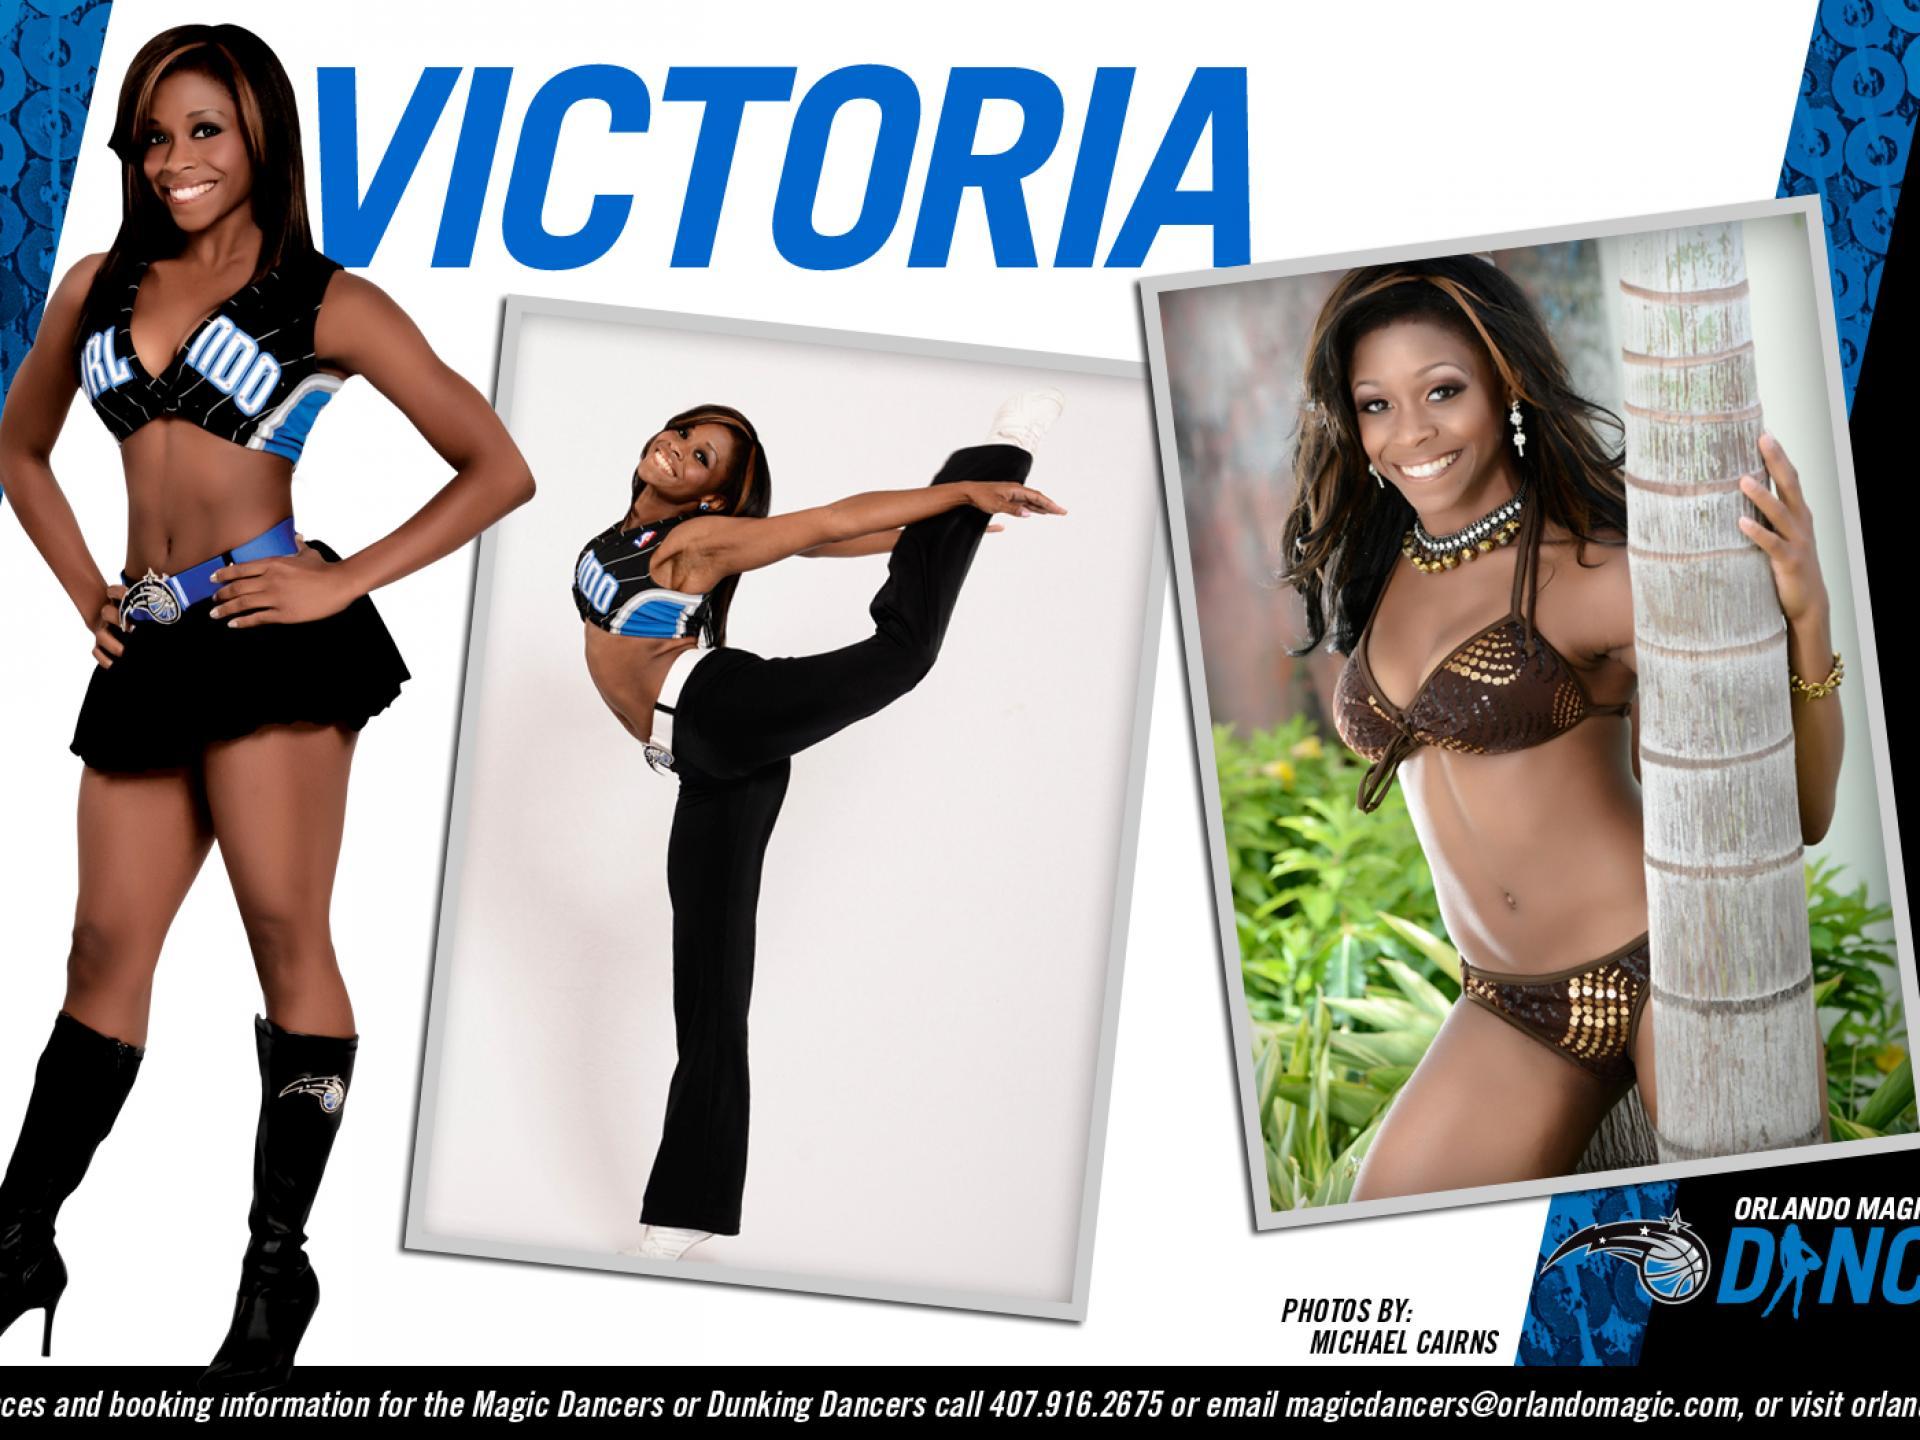 magic dancers  victoria   United States  USA Pictures HD Wallpaper